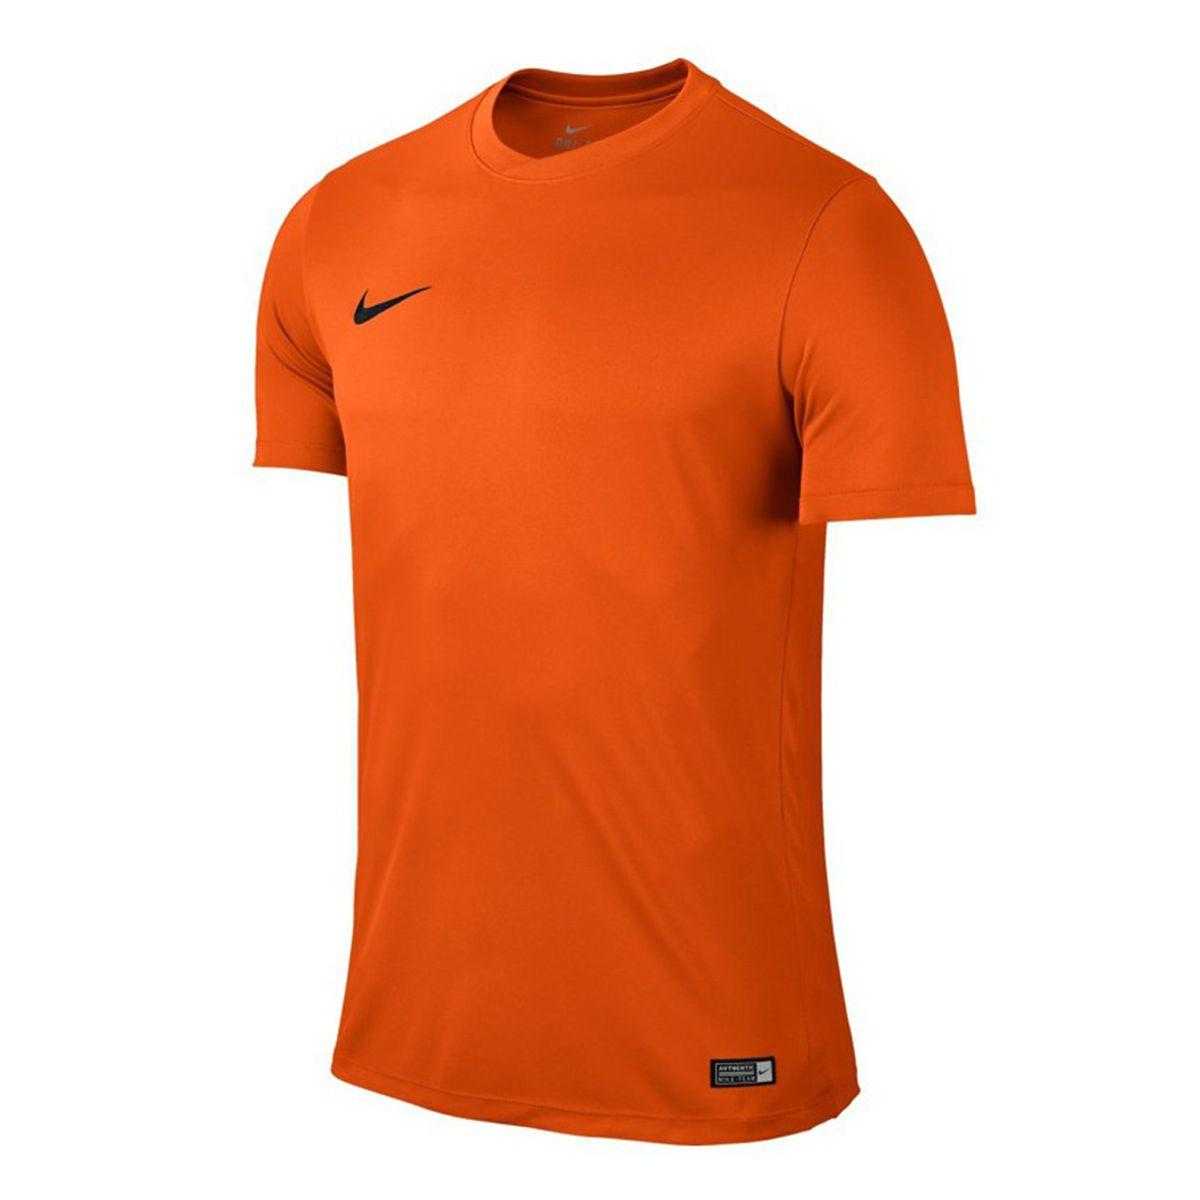 Nike 725891 Ss Park VI Jsy Kısa Kol Forma